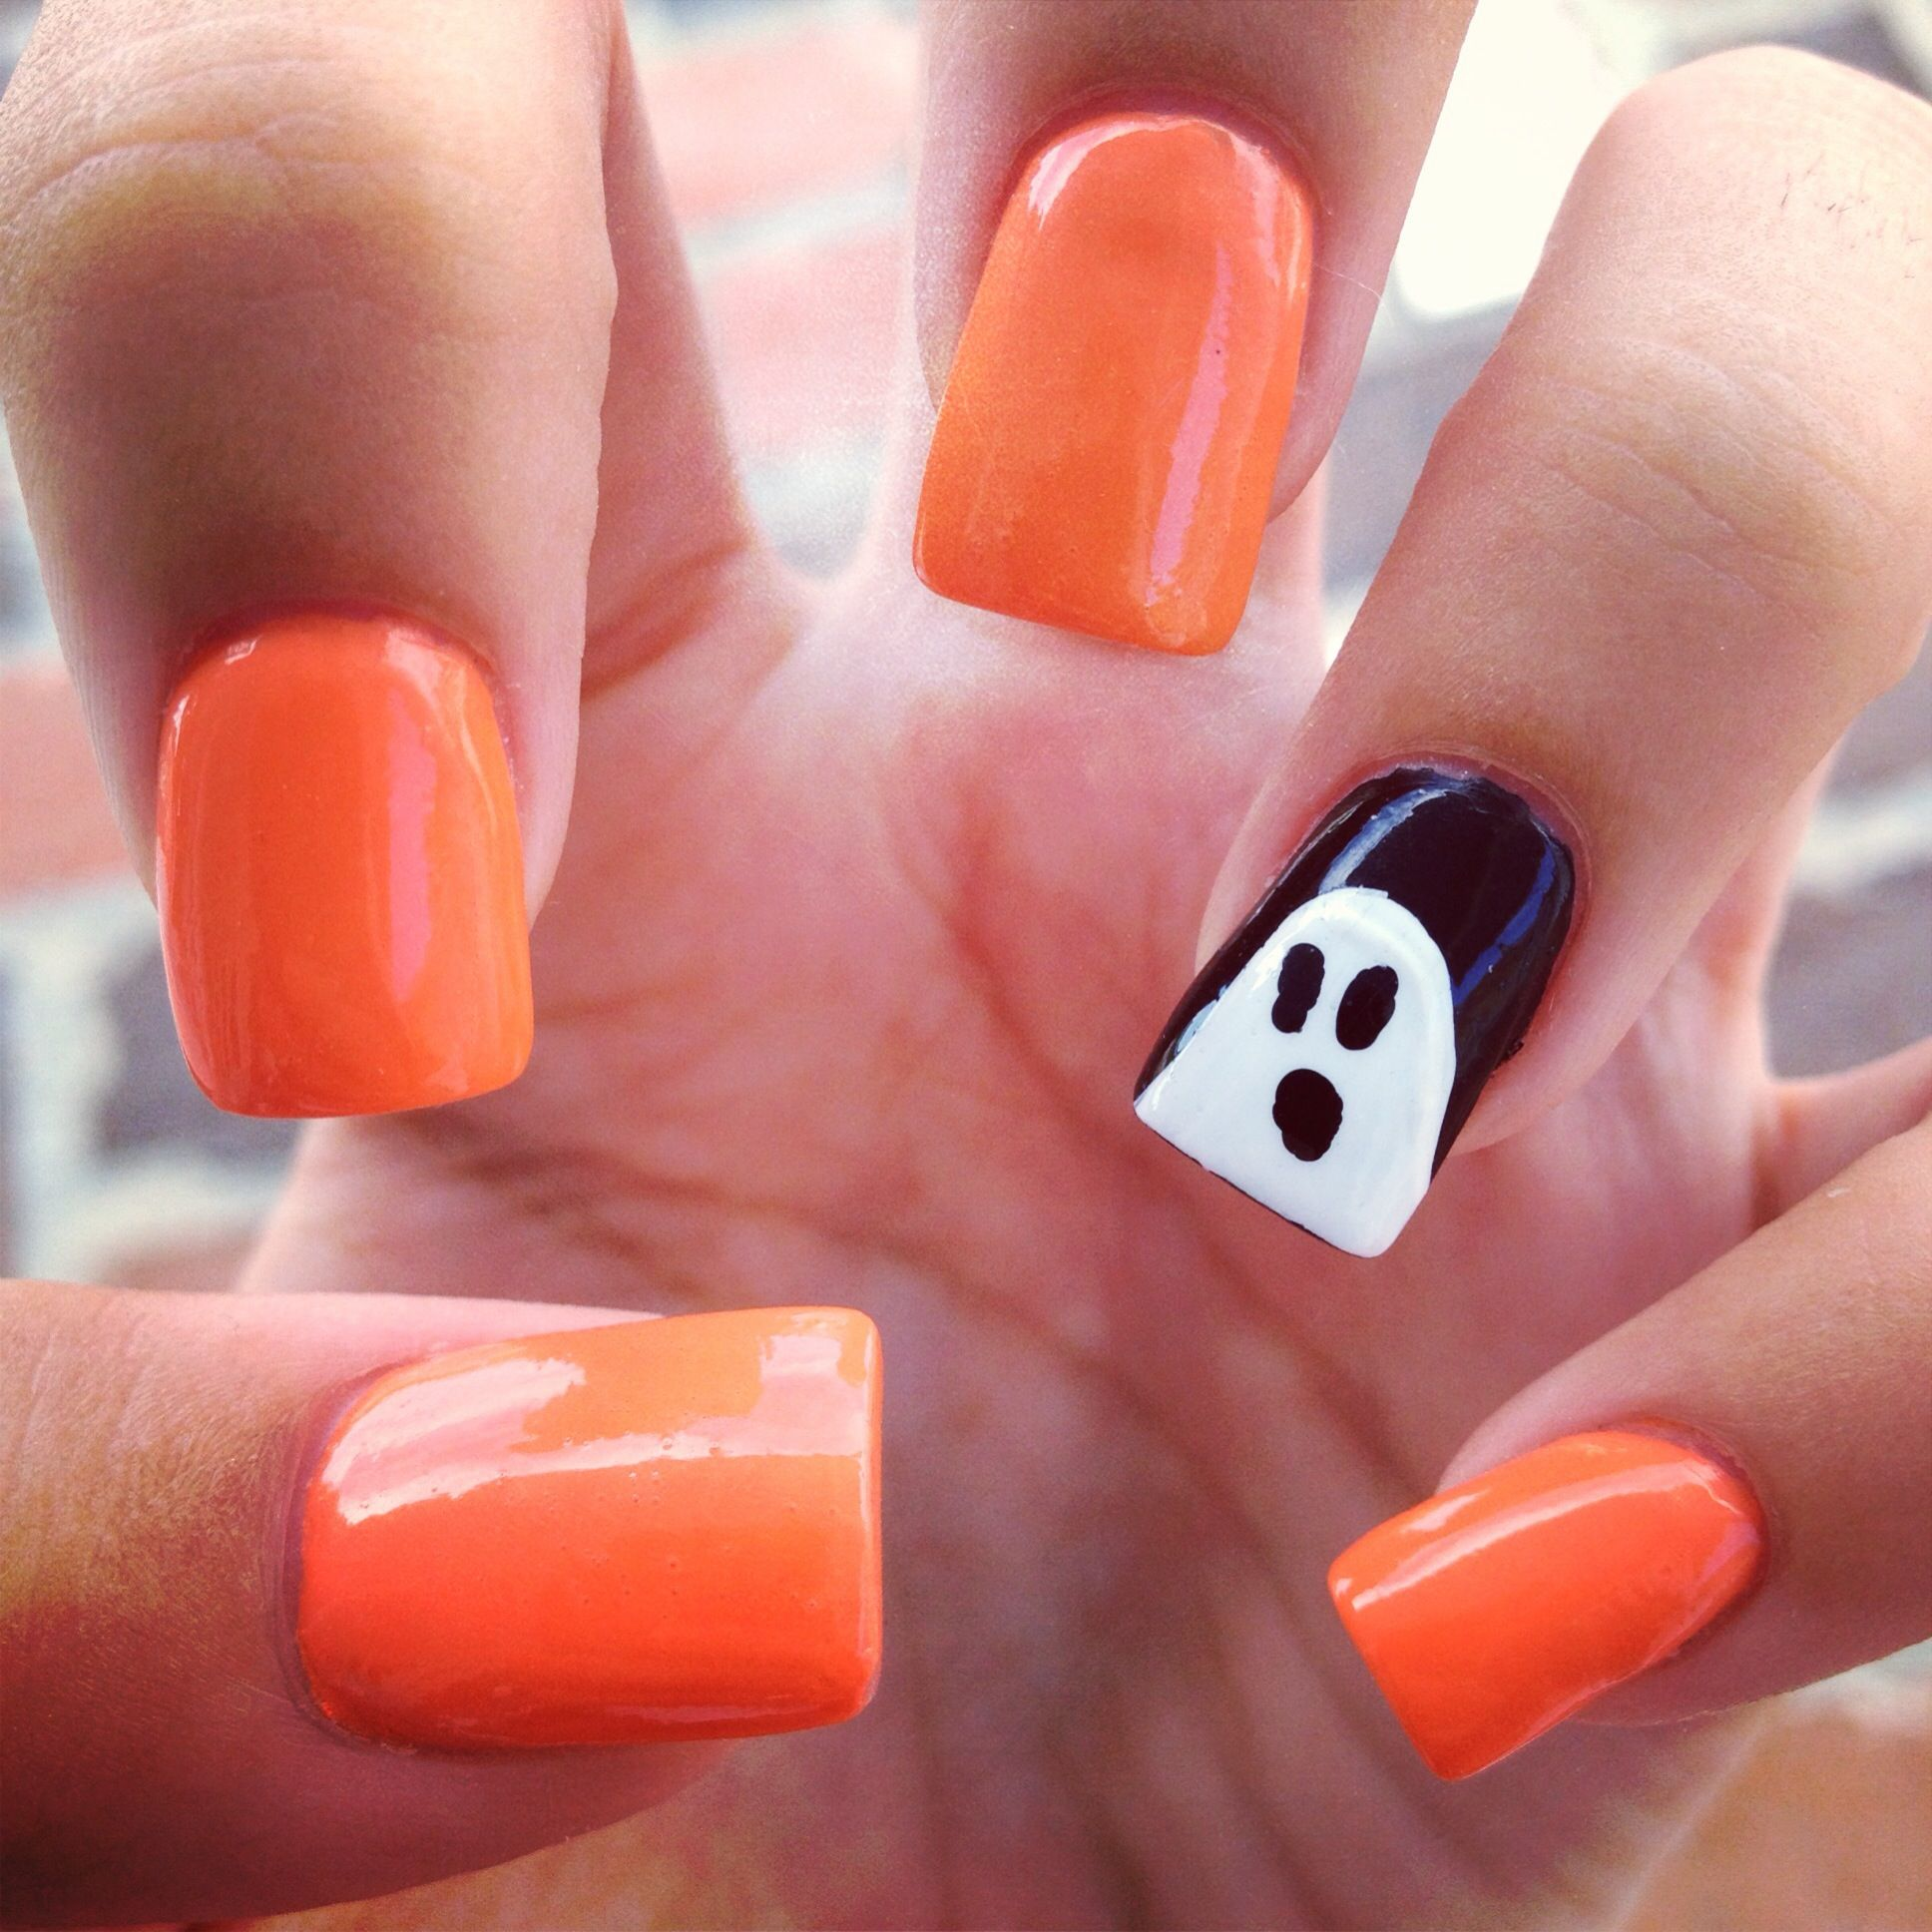 Halloween nails #acrylic #nails #ghost #festive #halloween ...